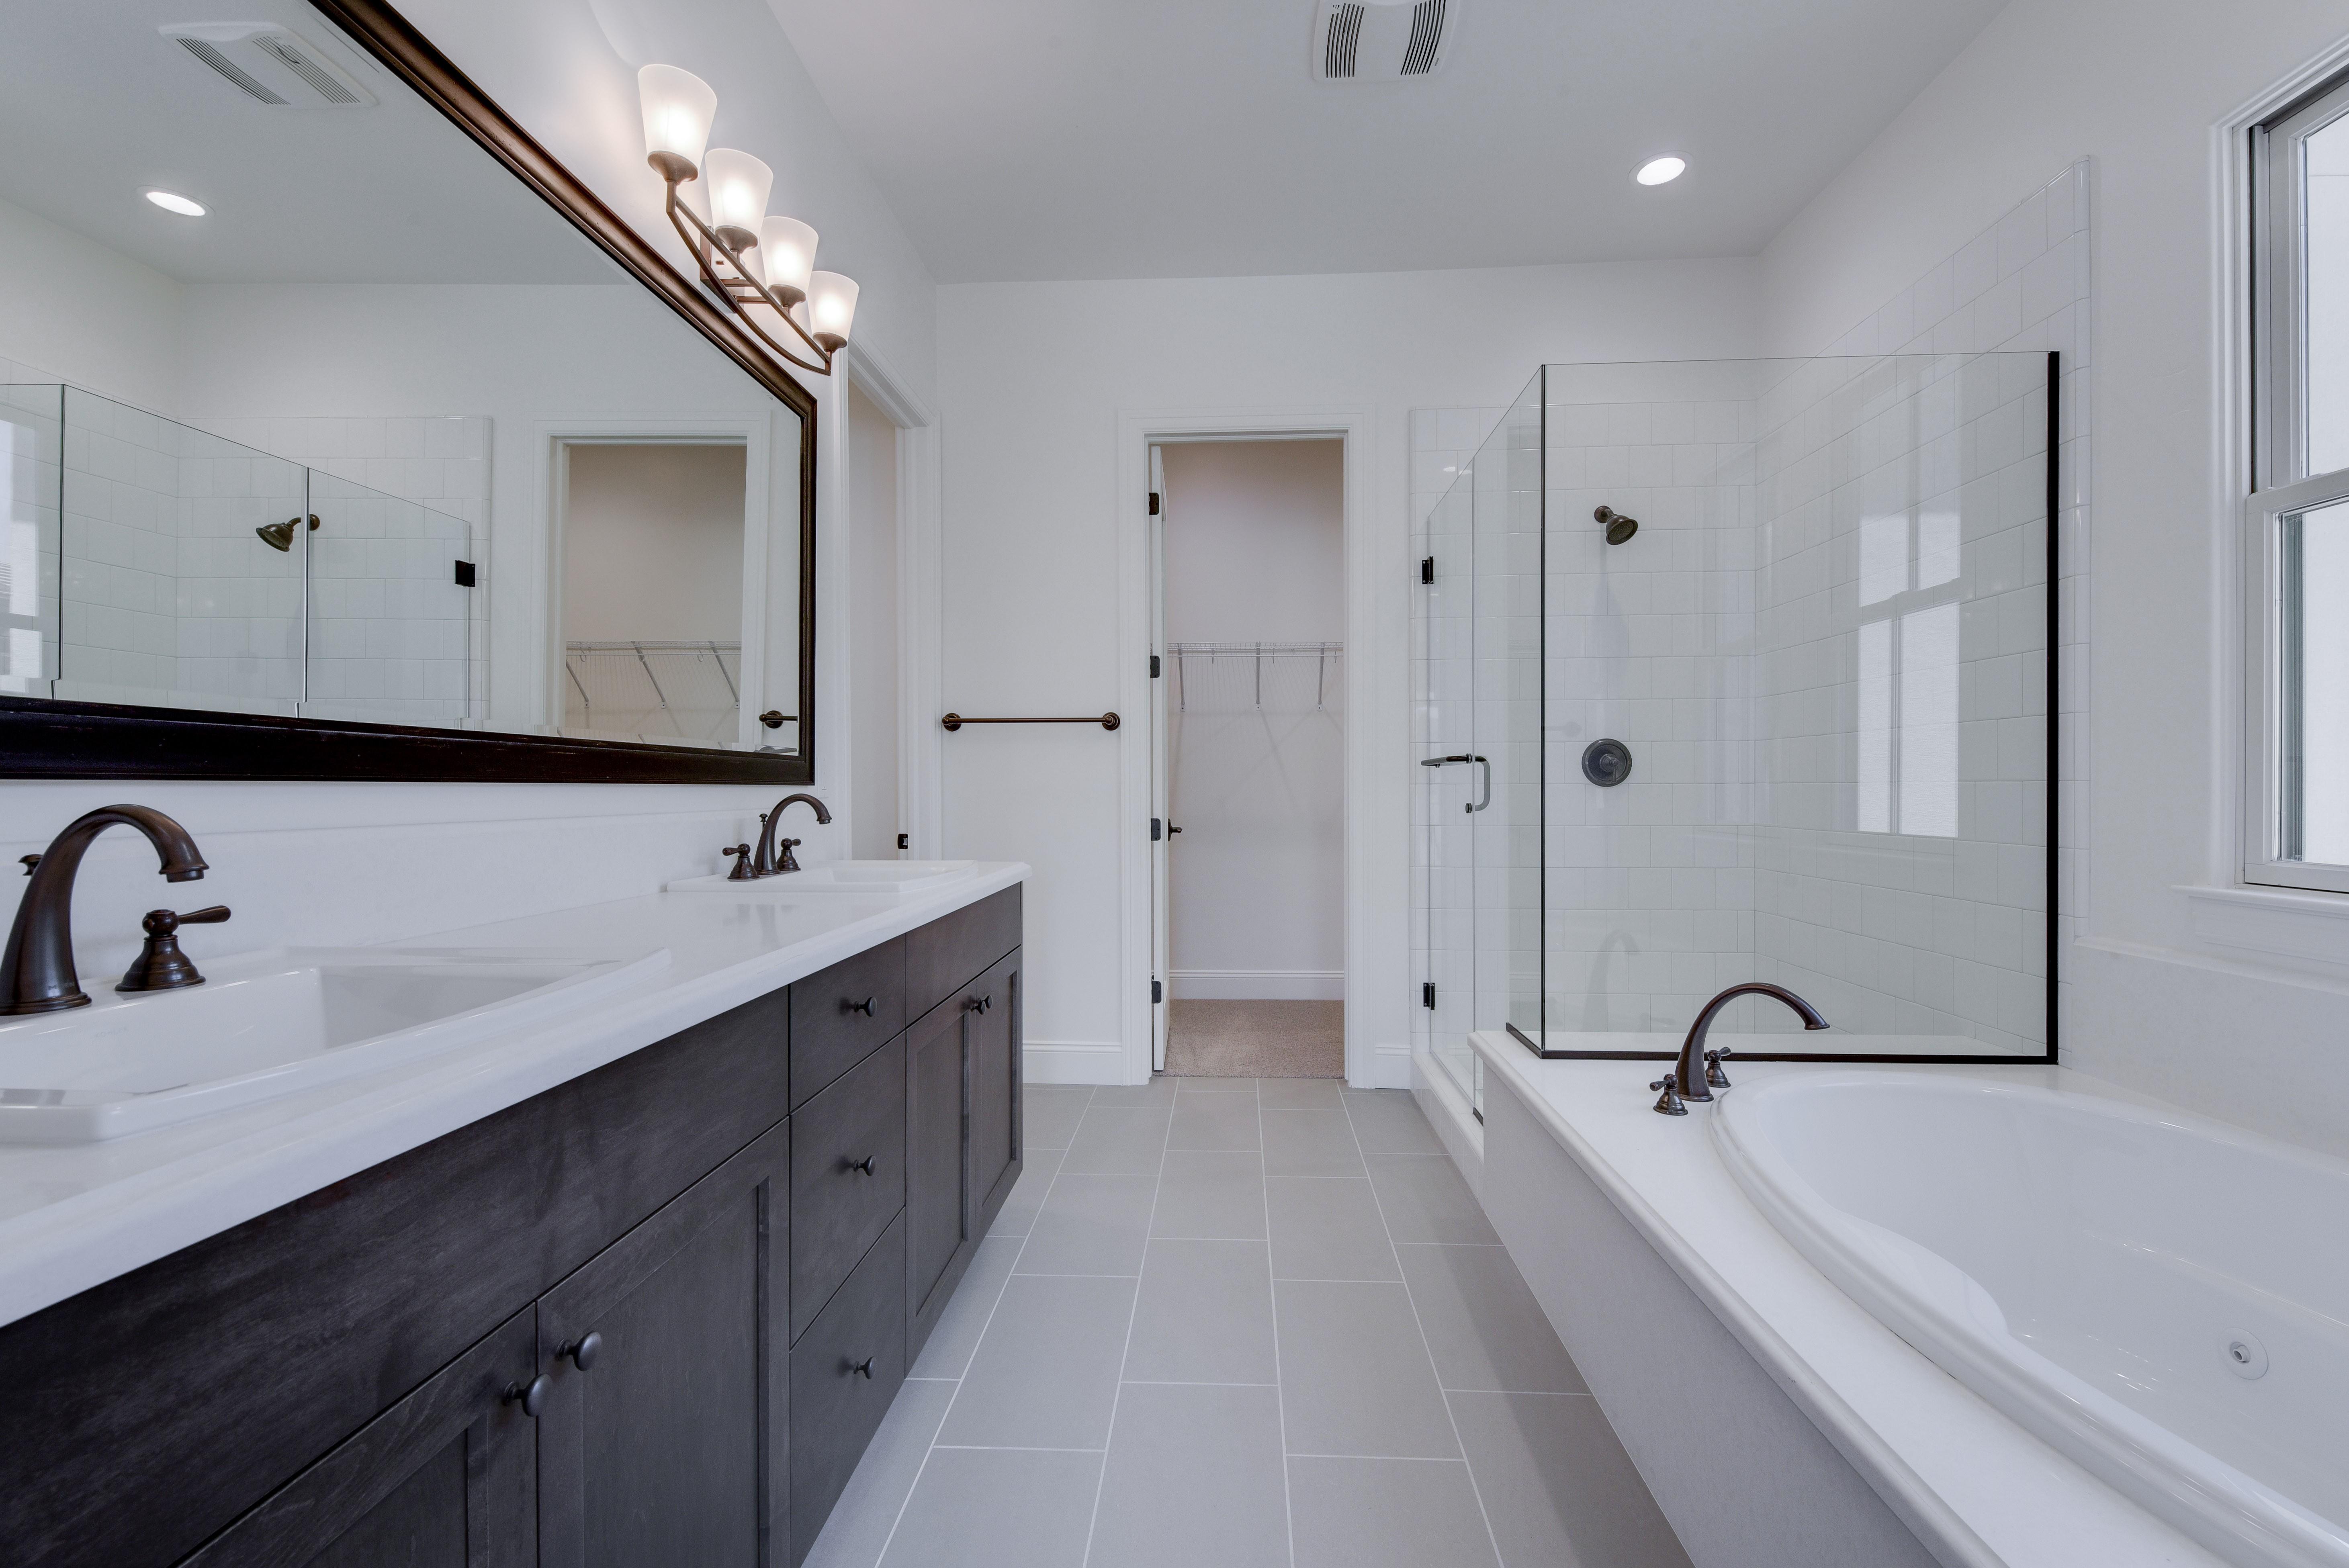 Bathroom tiles   Elite Builder Services